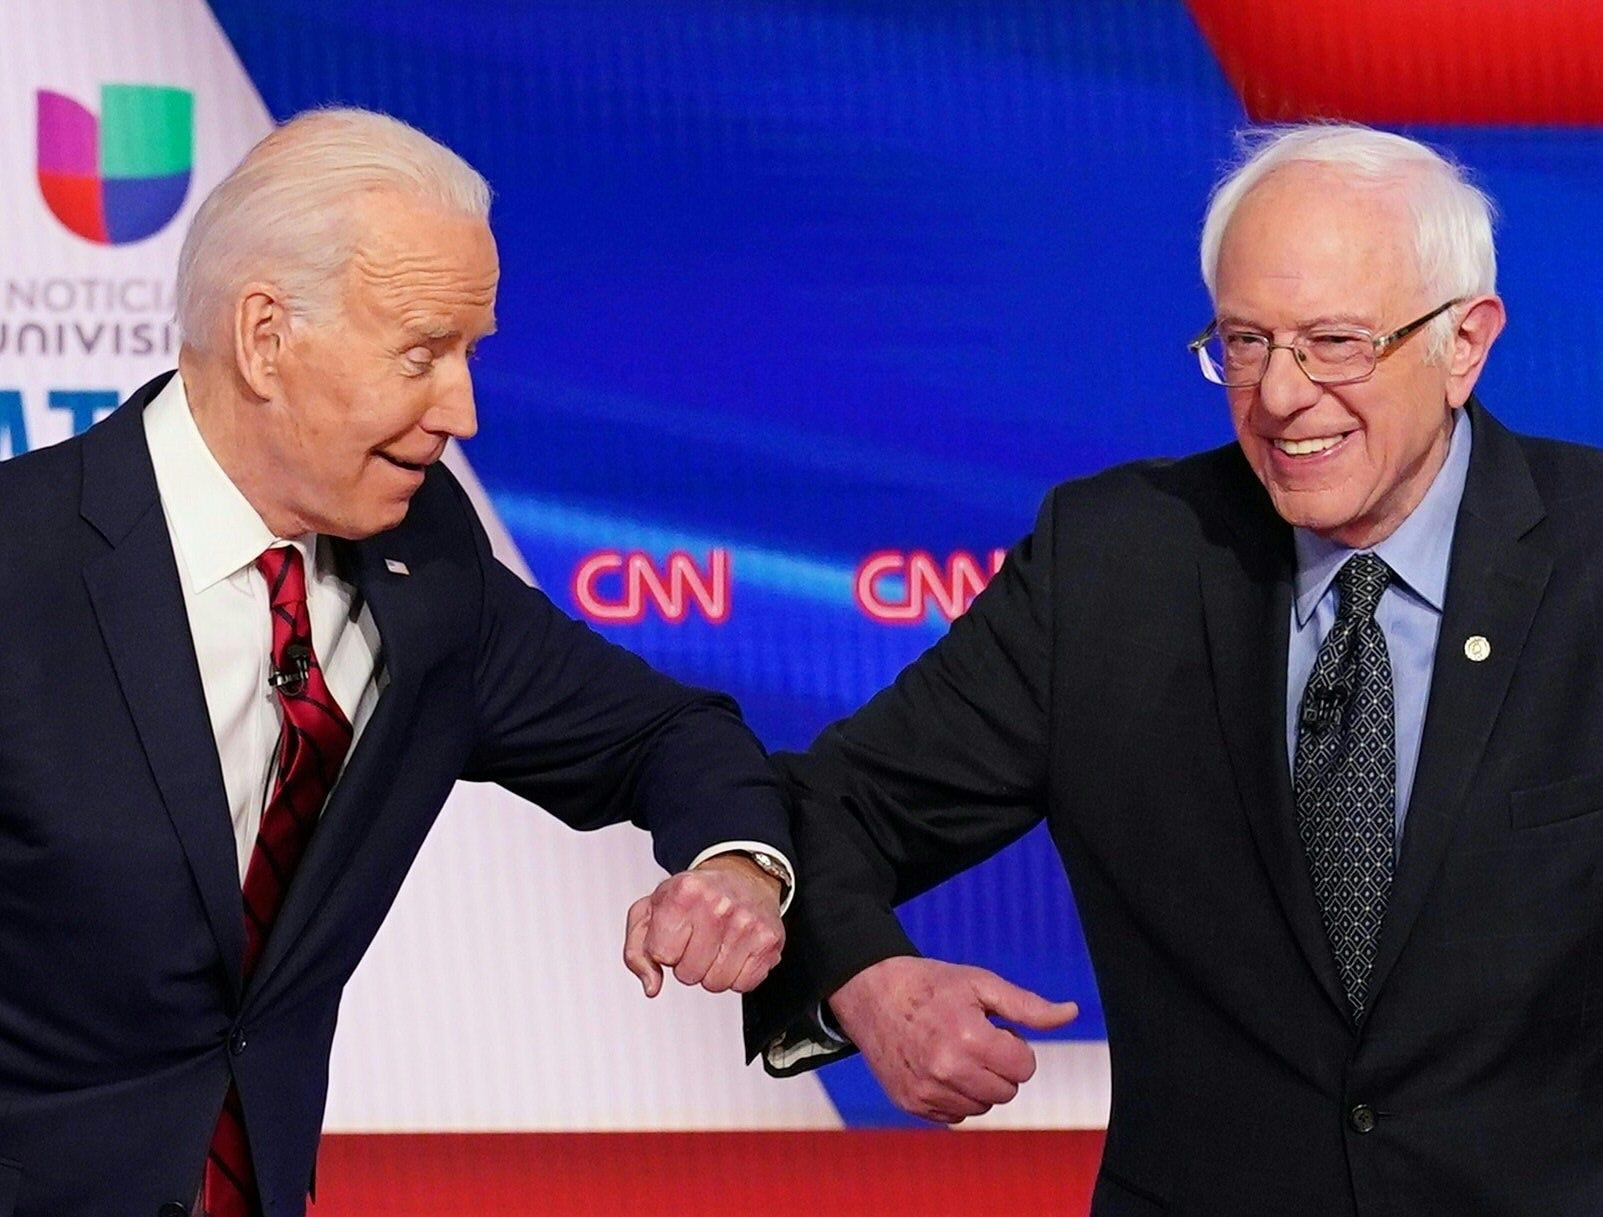 The Biden-Sanders coronavirus debate was one for the history books: Mastio & Lawrence